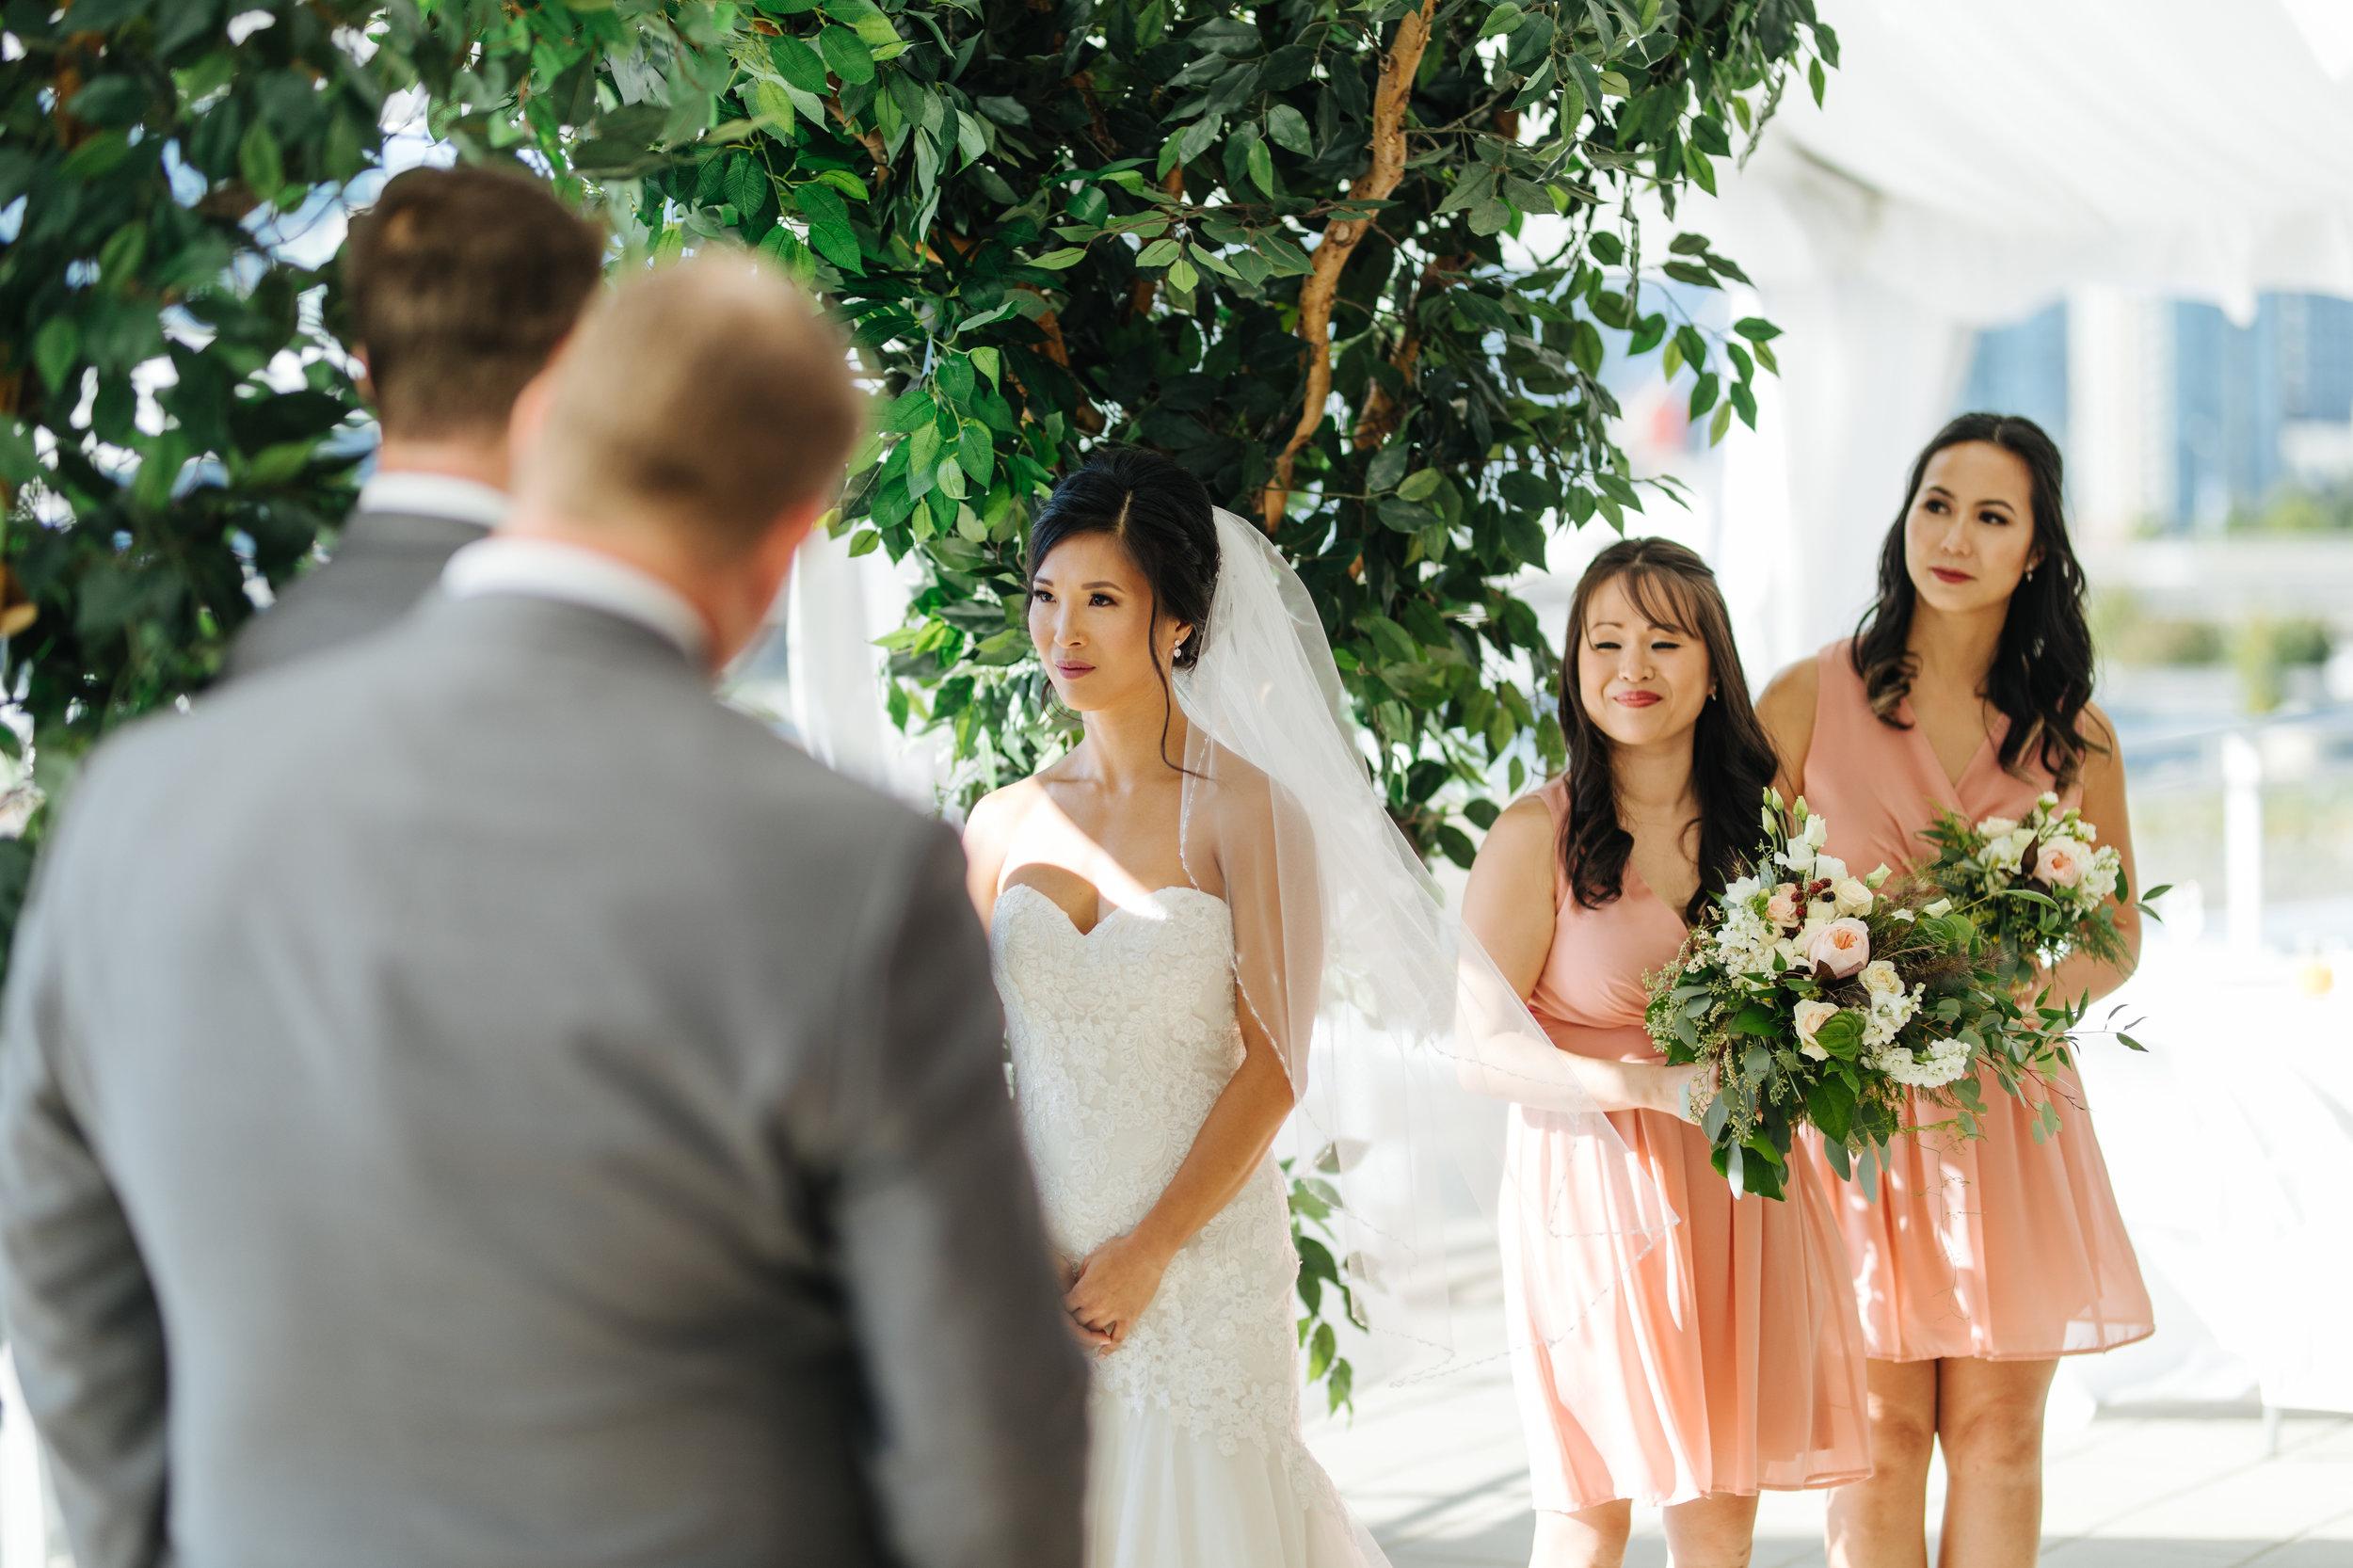 herastudios_wedding_dana_shawn_hera_selects-64.jpg